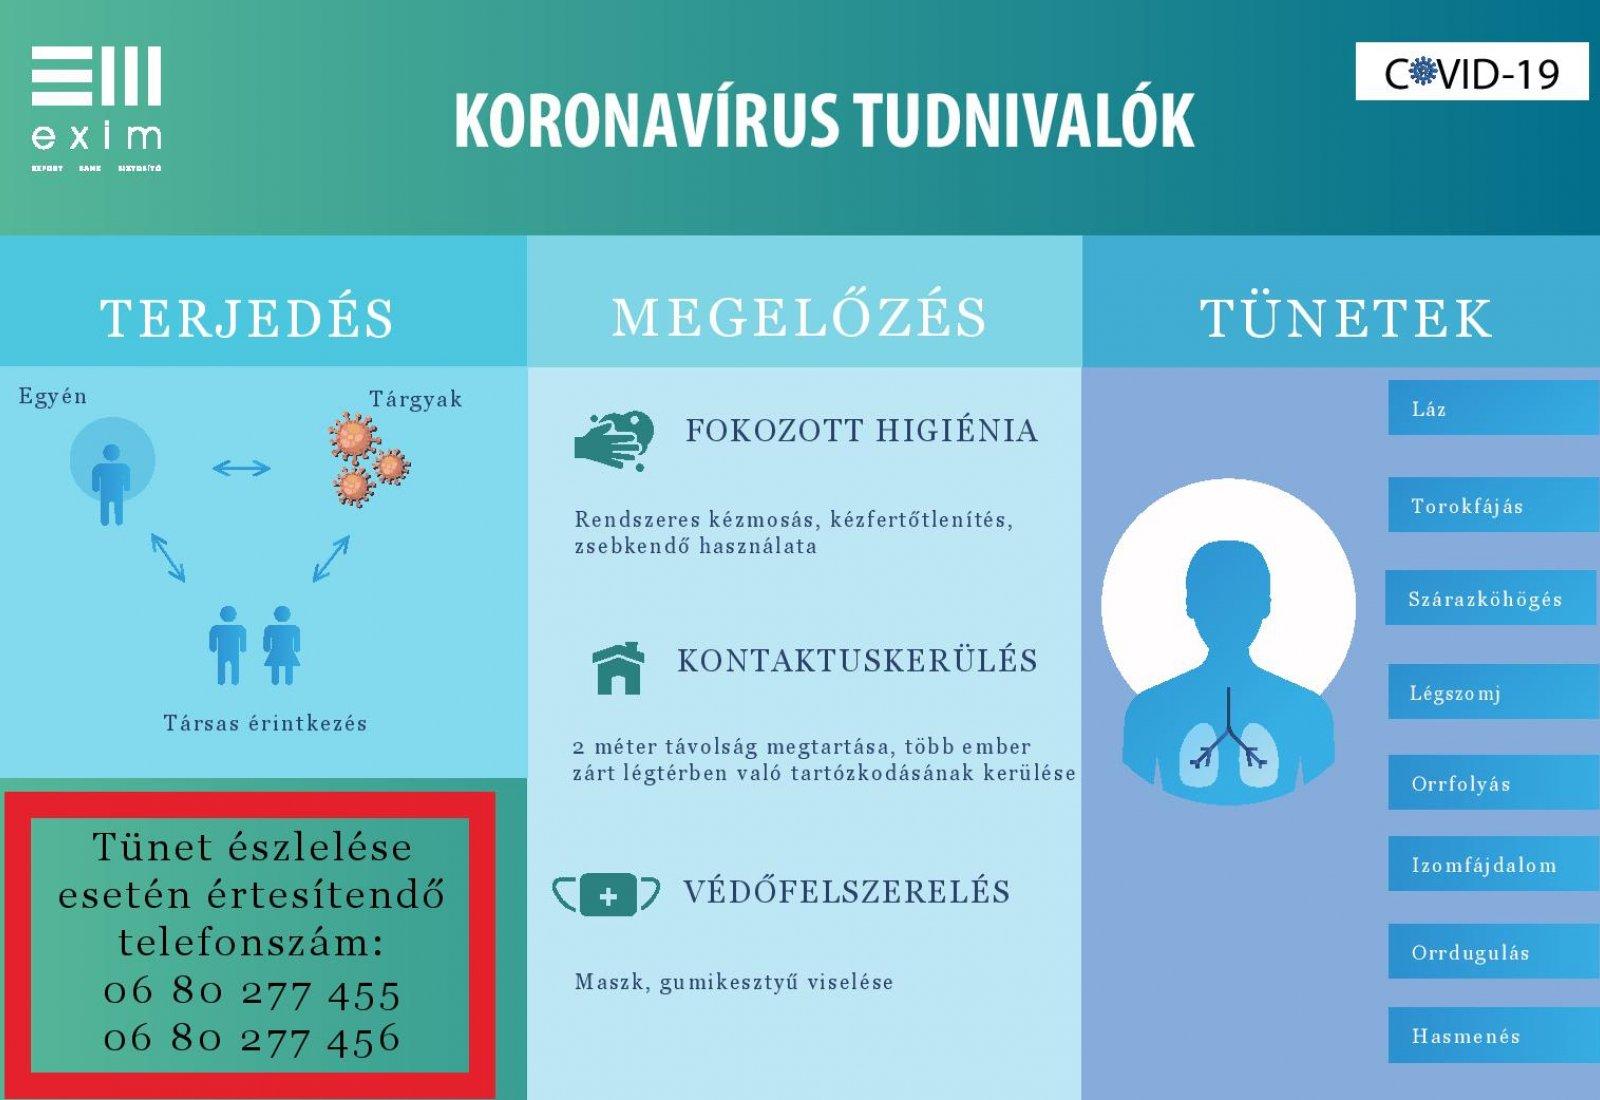 Koronavírus tudnivalók